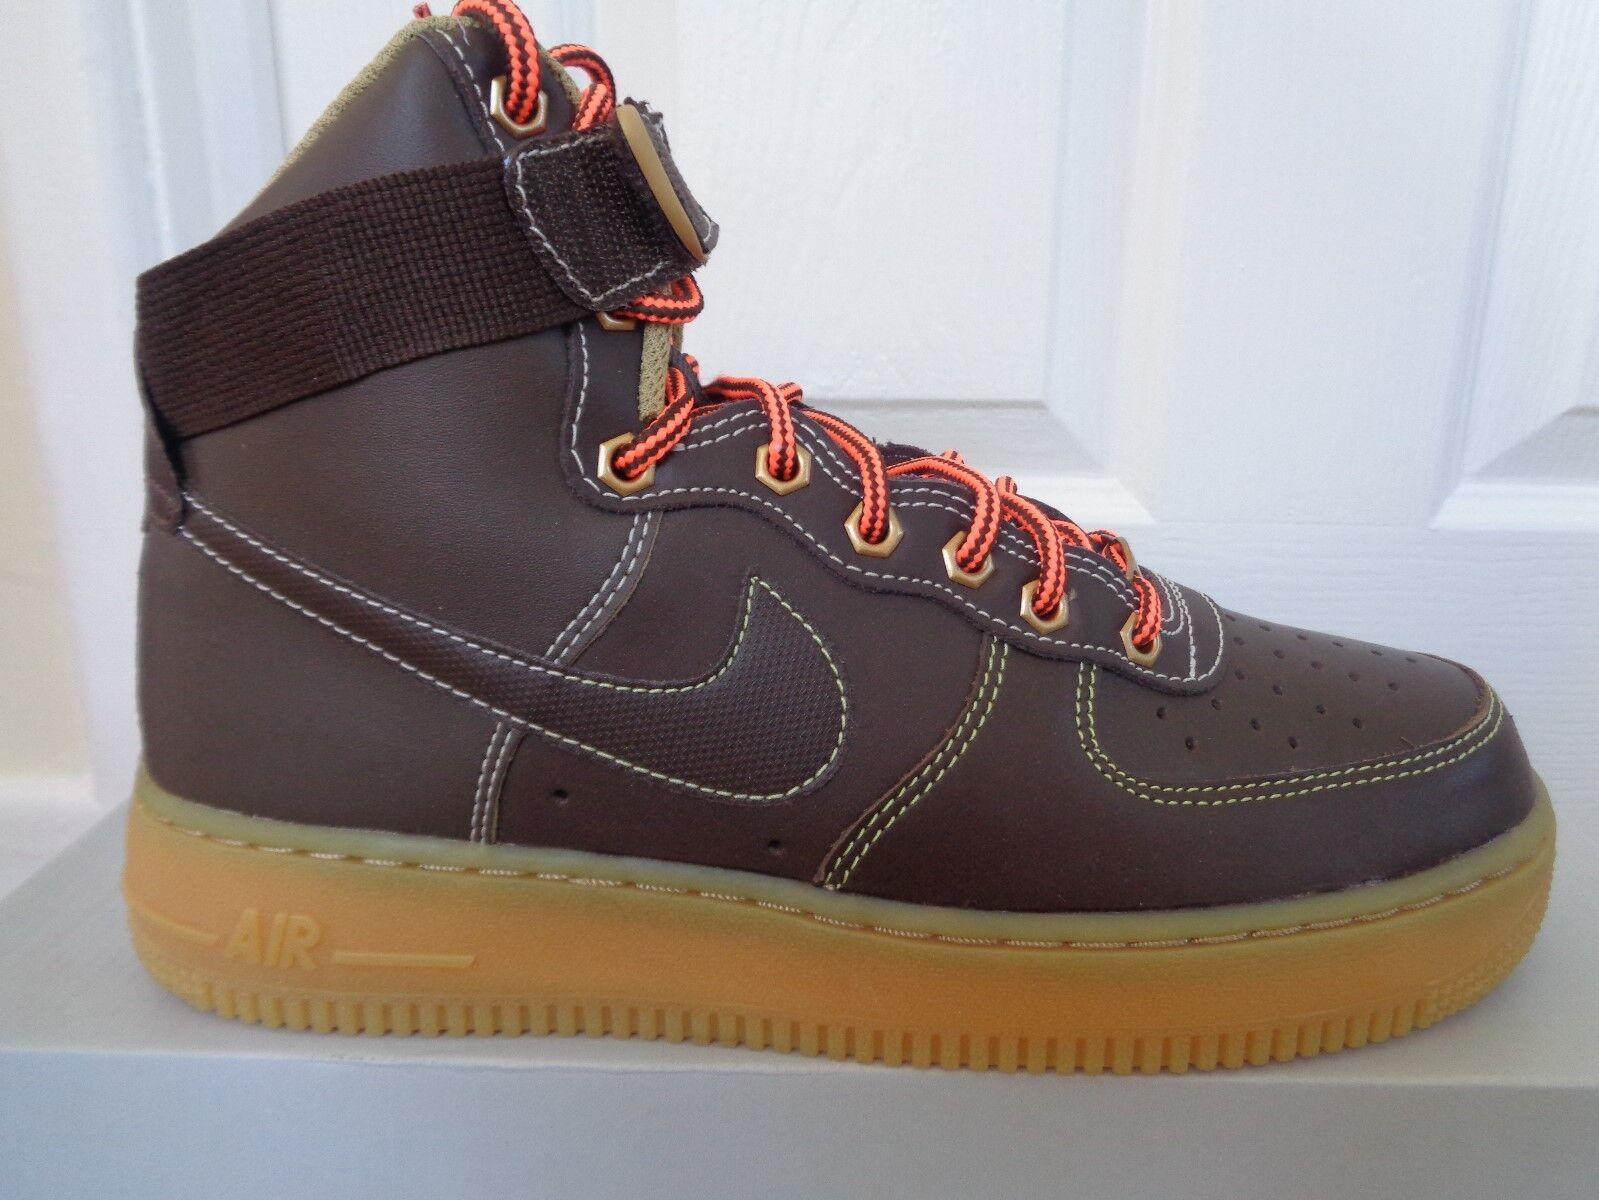 Nike '07 Air Obliger 1 High '07 Nike trainers Bottes 315121 203 uk 6 eu 40 us 7 NEW IN BOX c14ecc